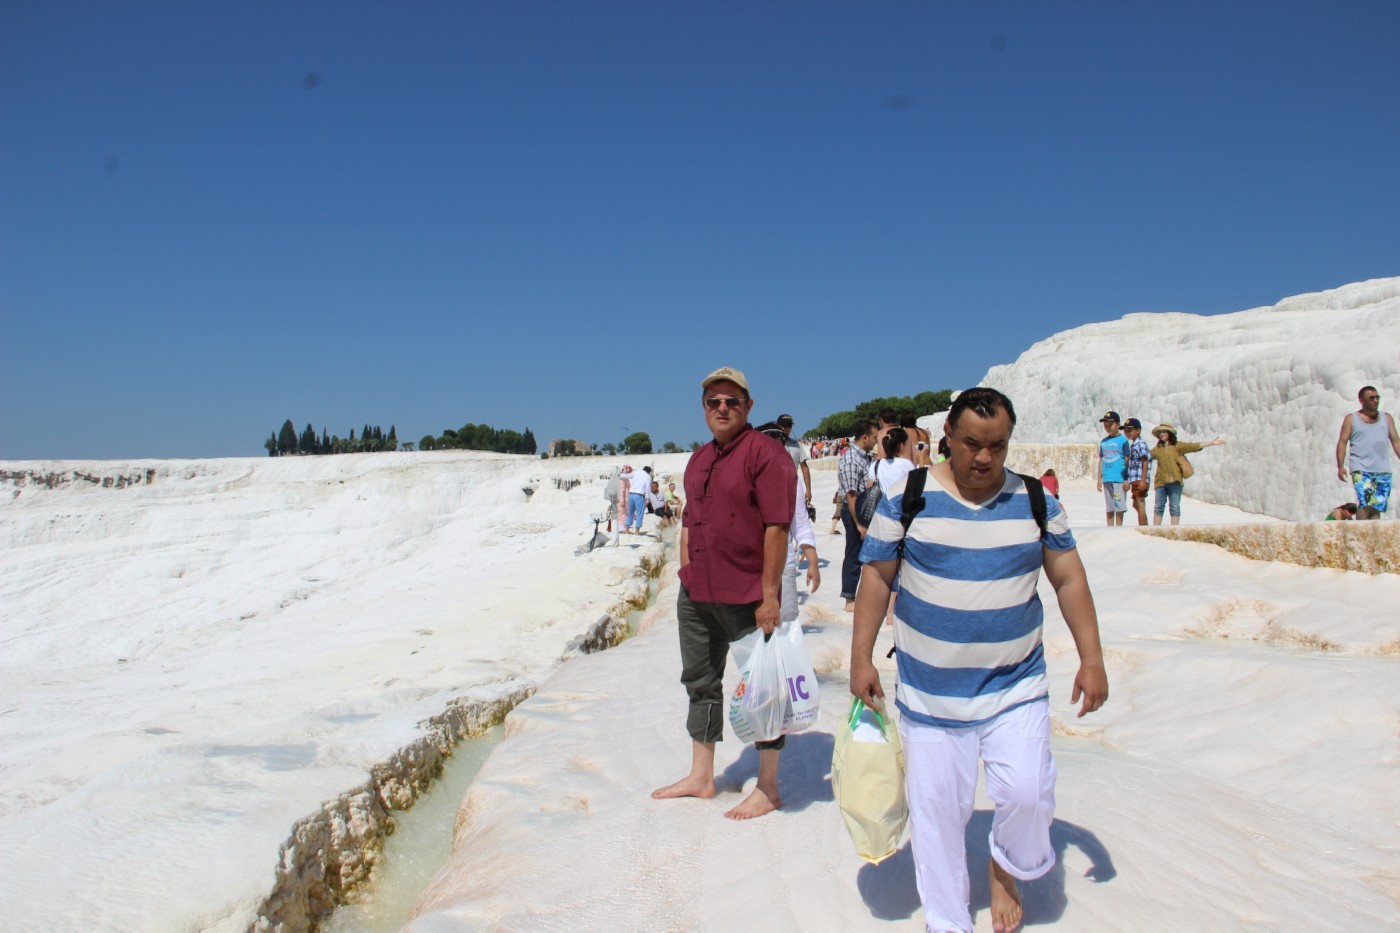 турция, памук-кале